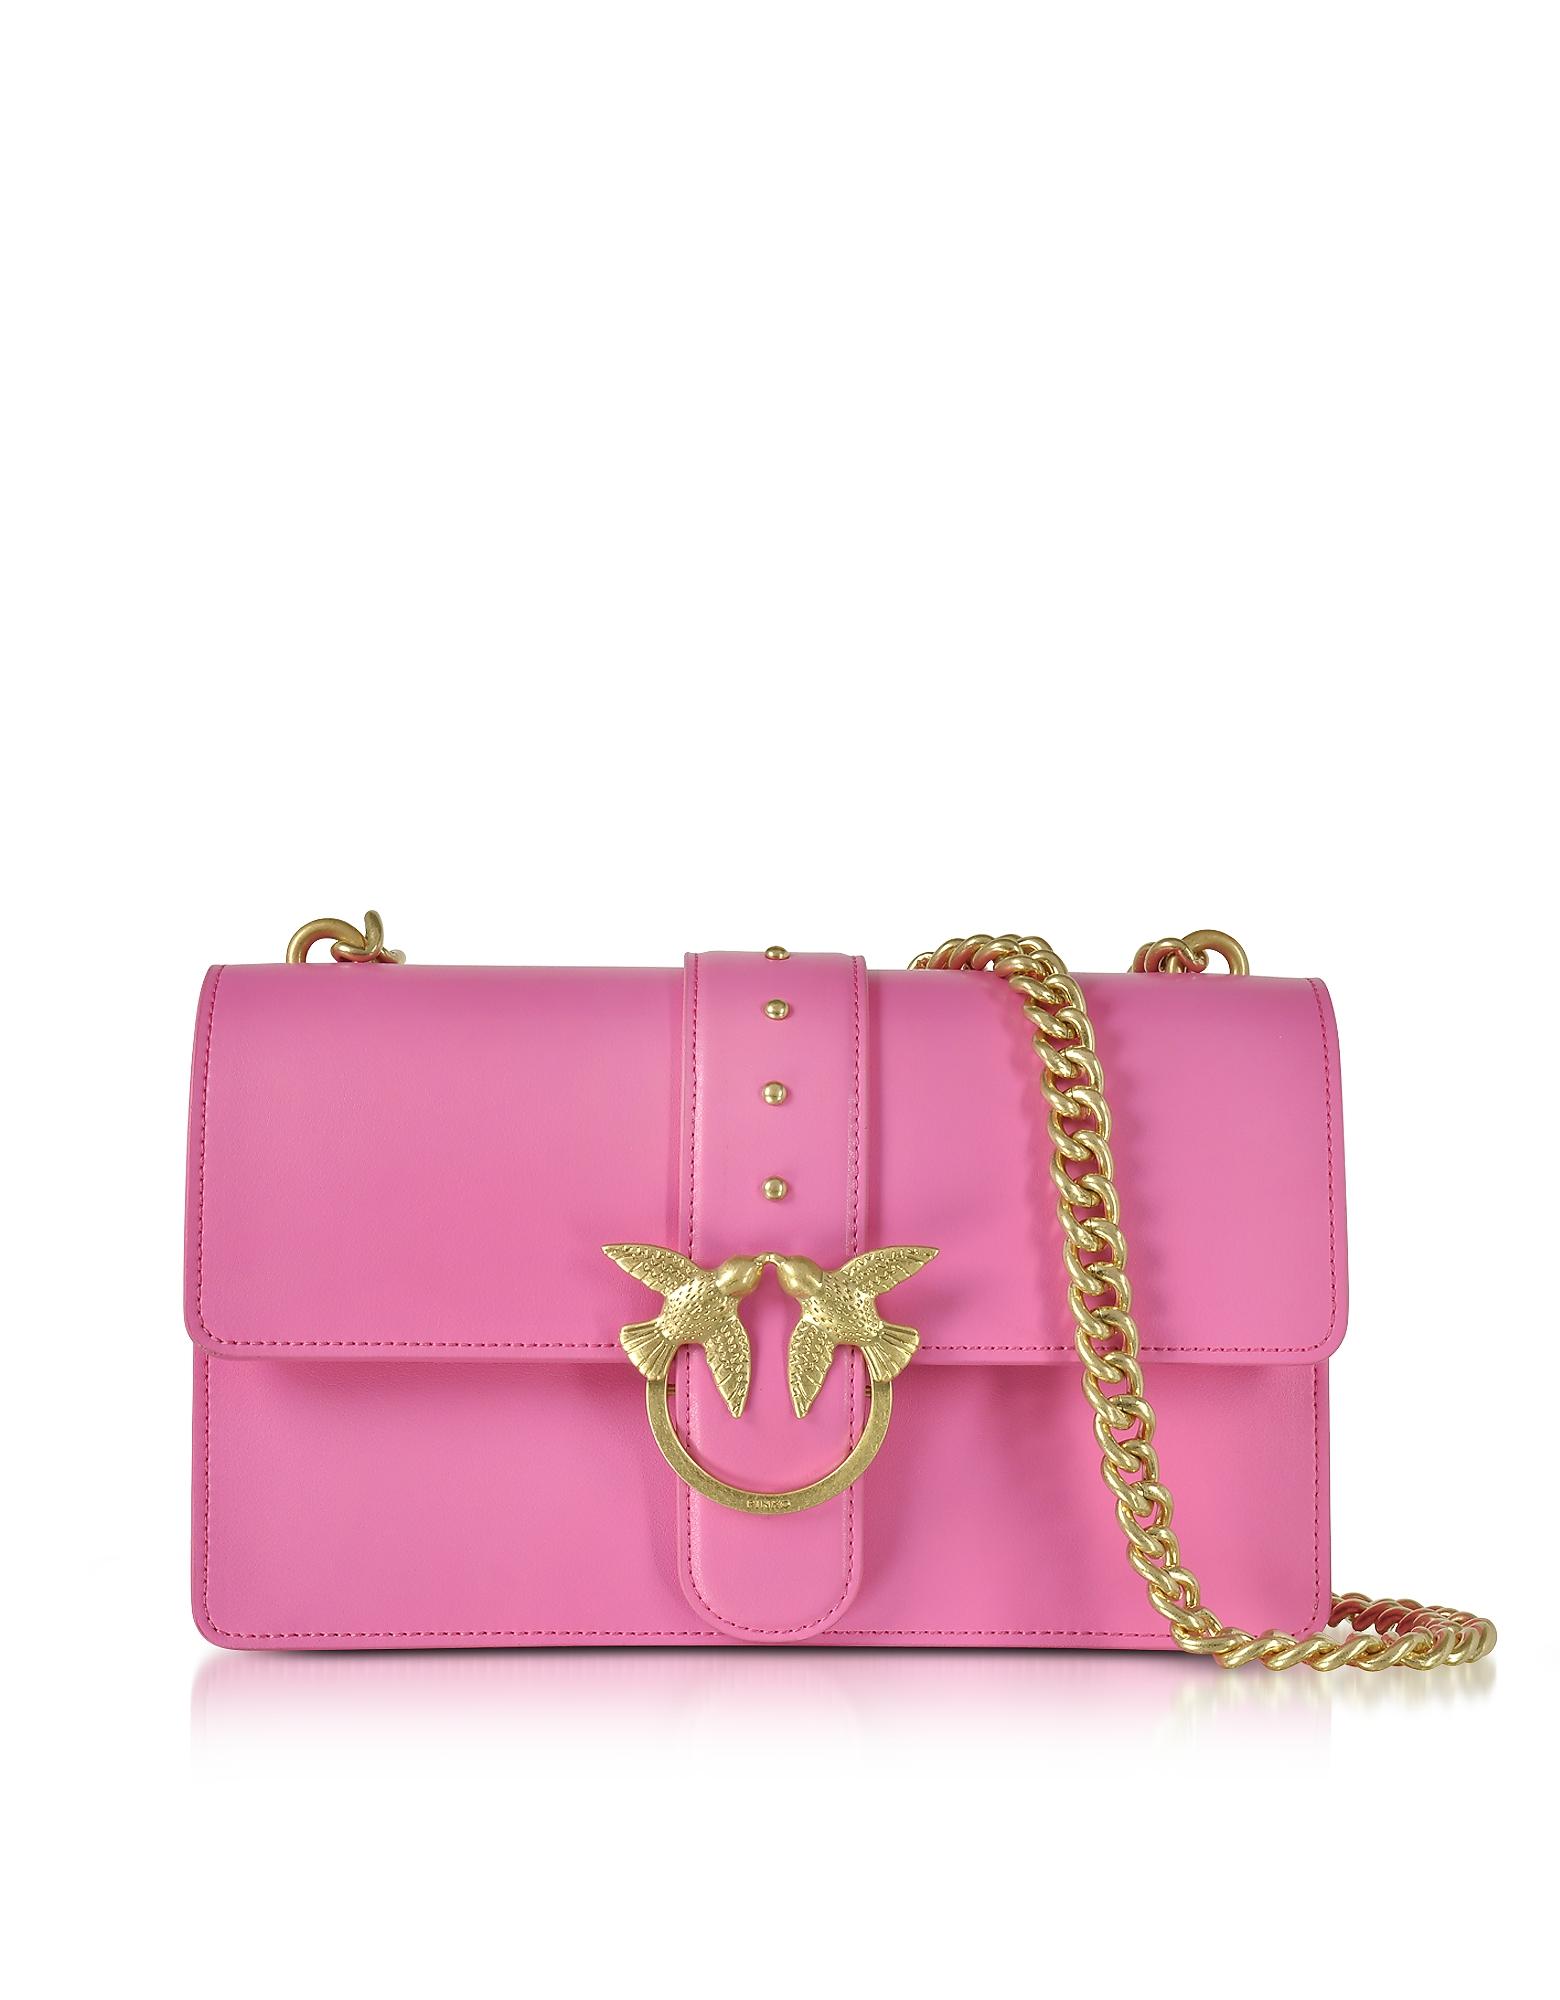 Pinko Handbags, Love Simply 2 Fuchsia Eco Leather Shoulder Bag